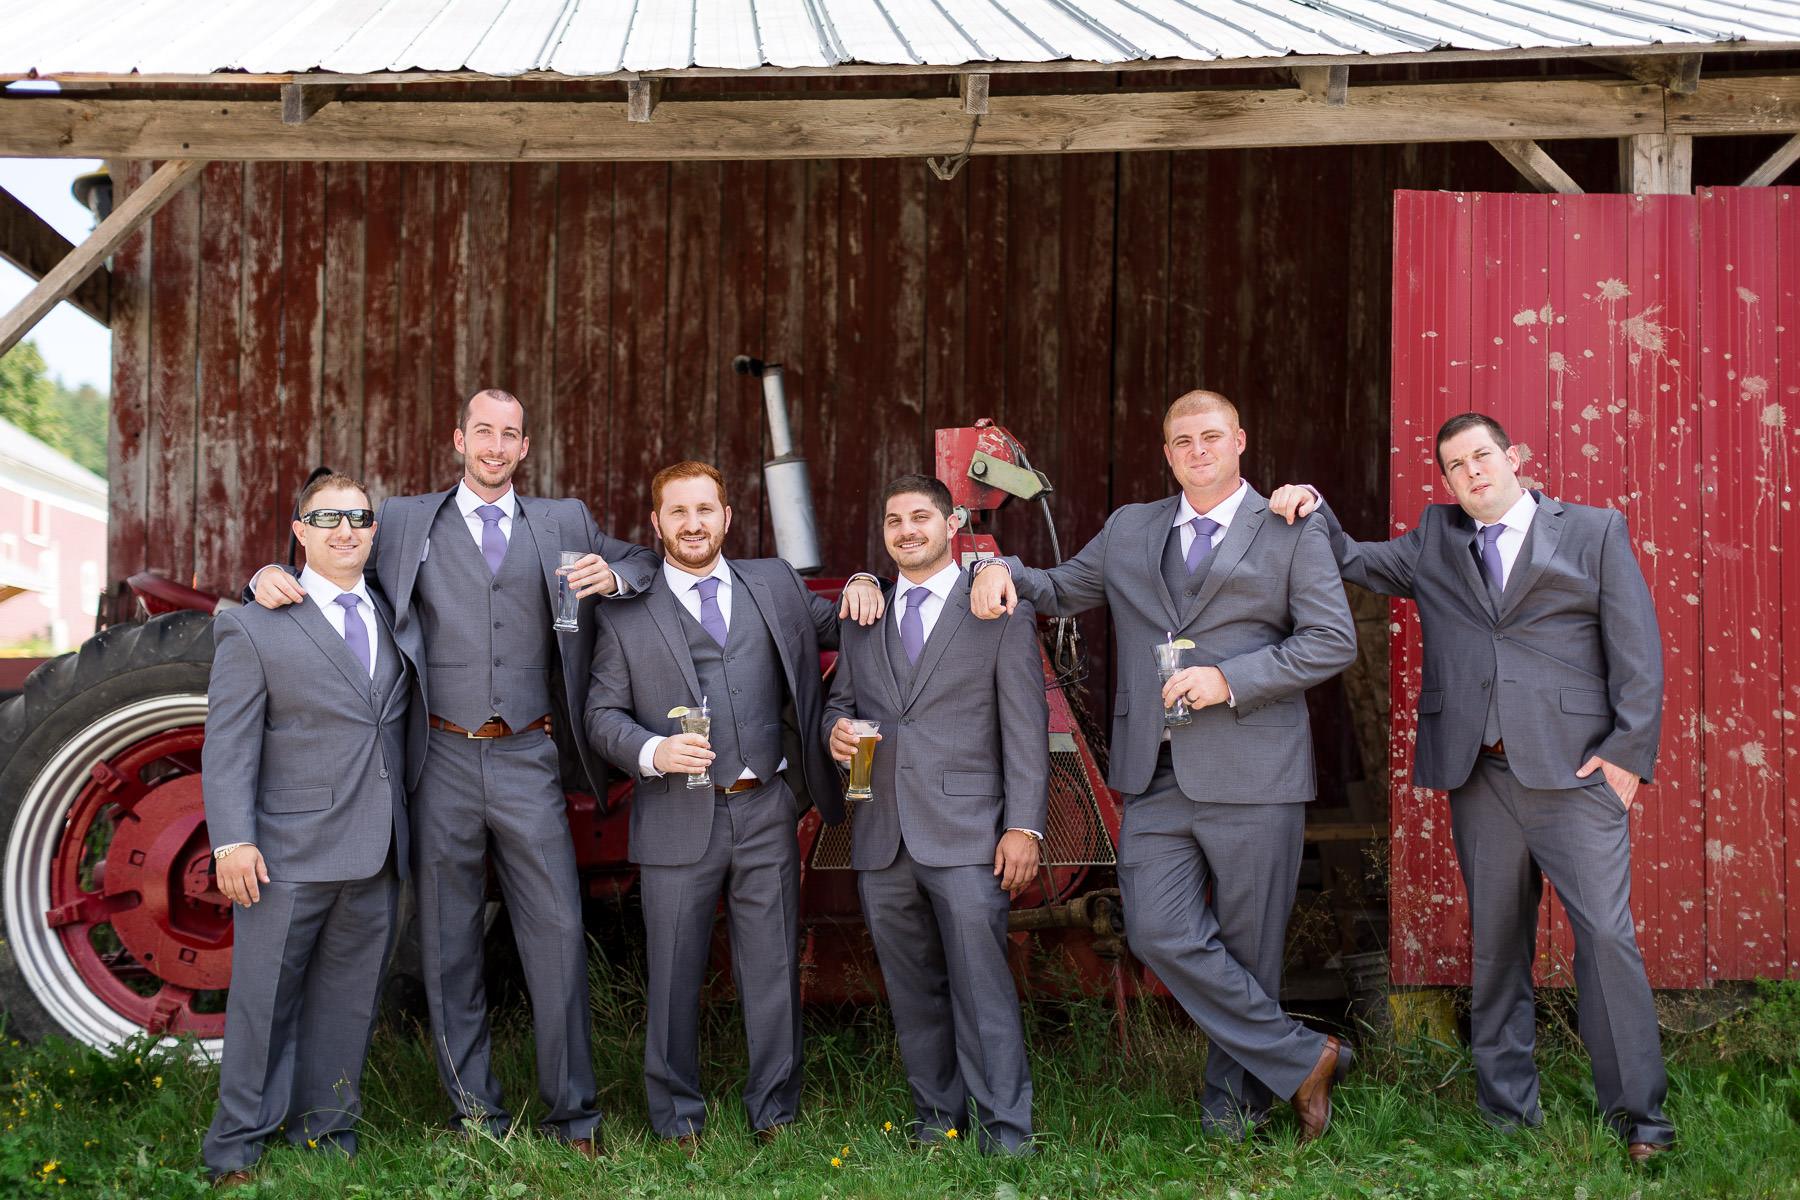 A Bucolic Vermont Wedding